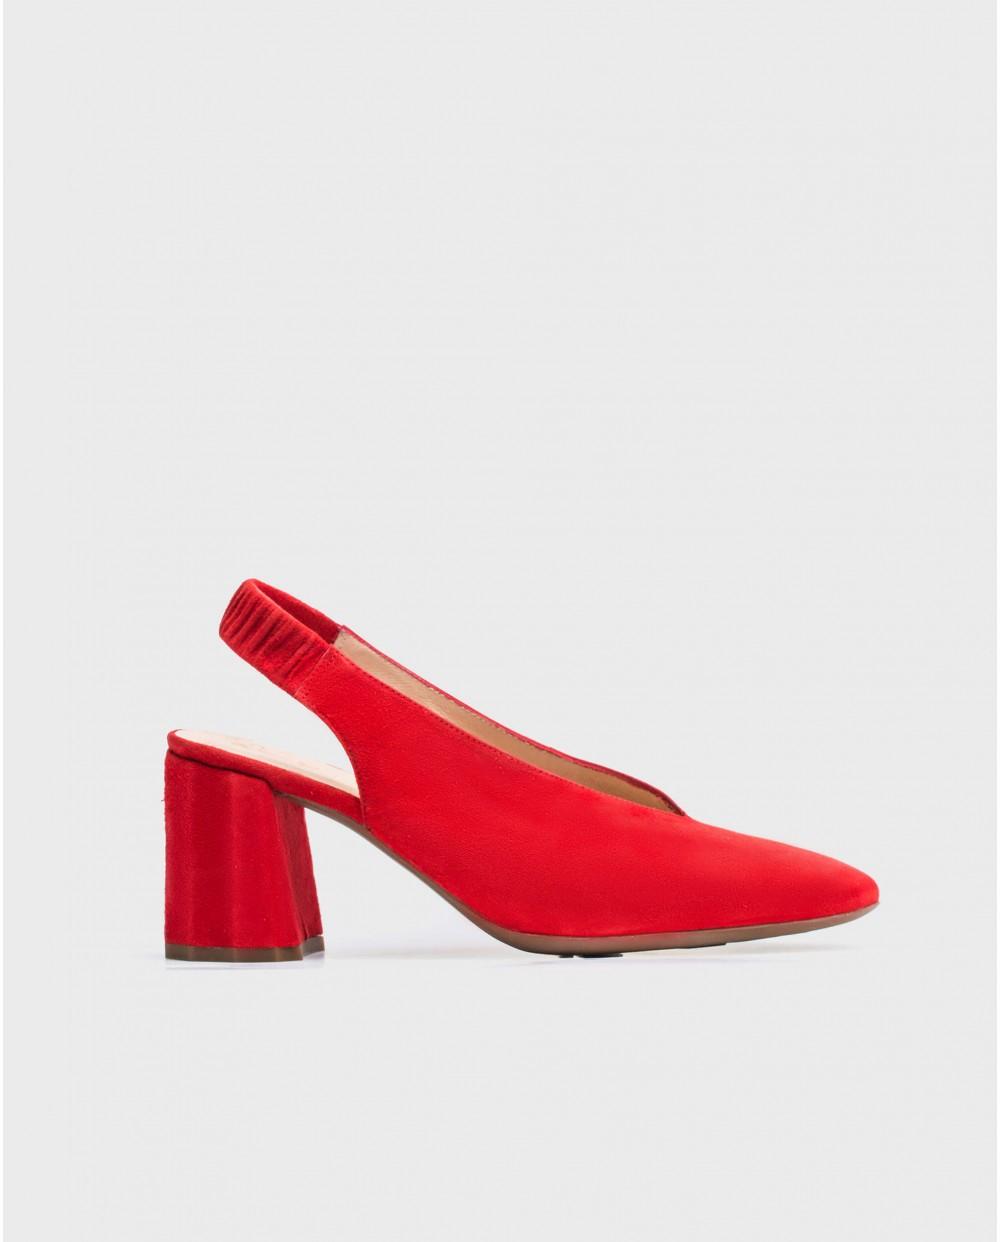 Wonders-Outlet-V cut leather court shoe